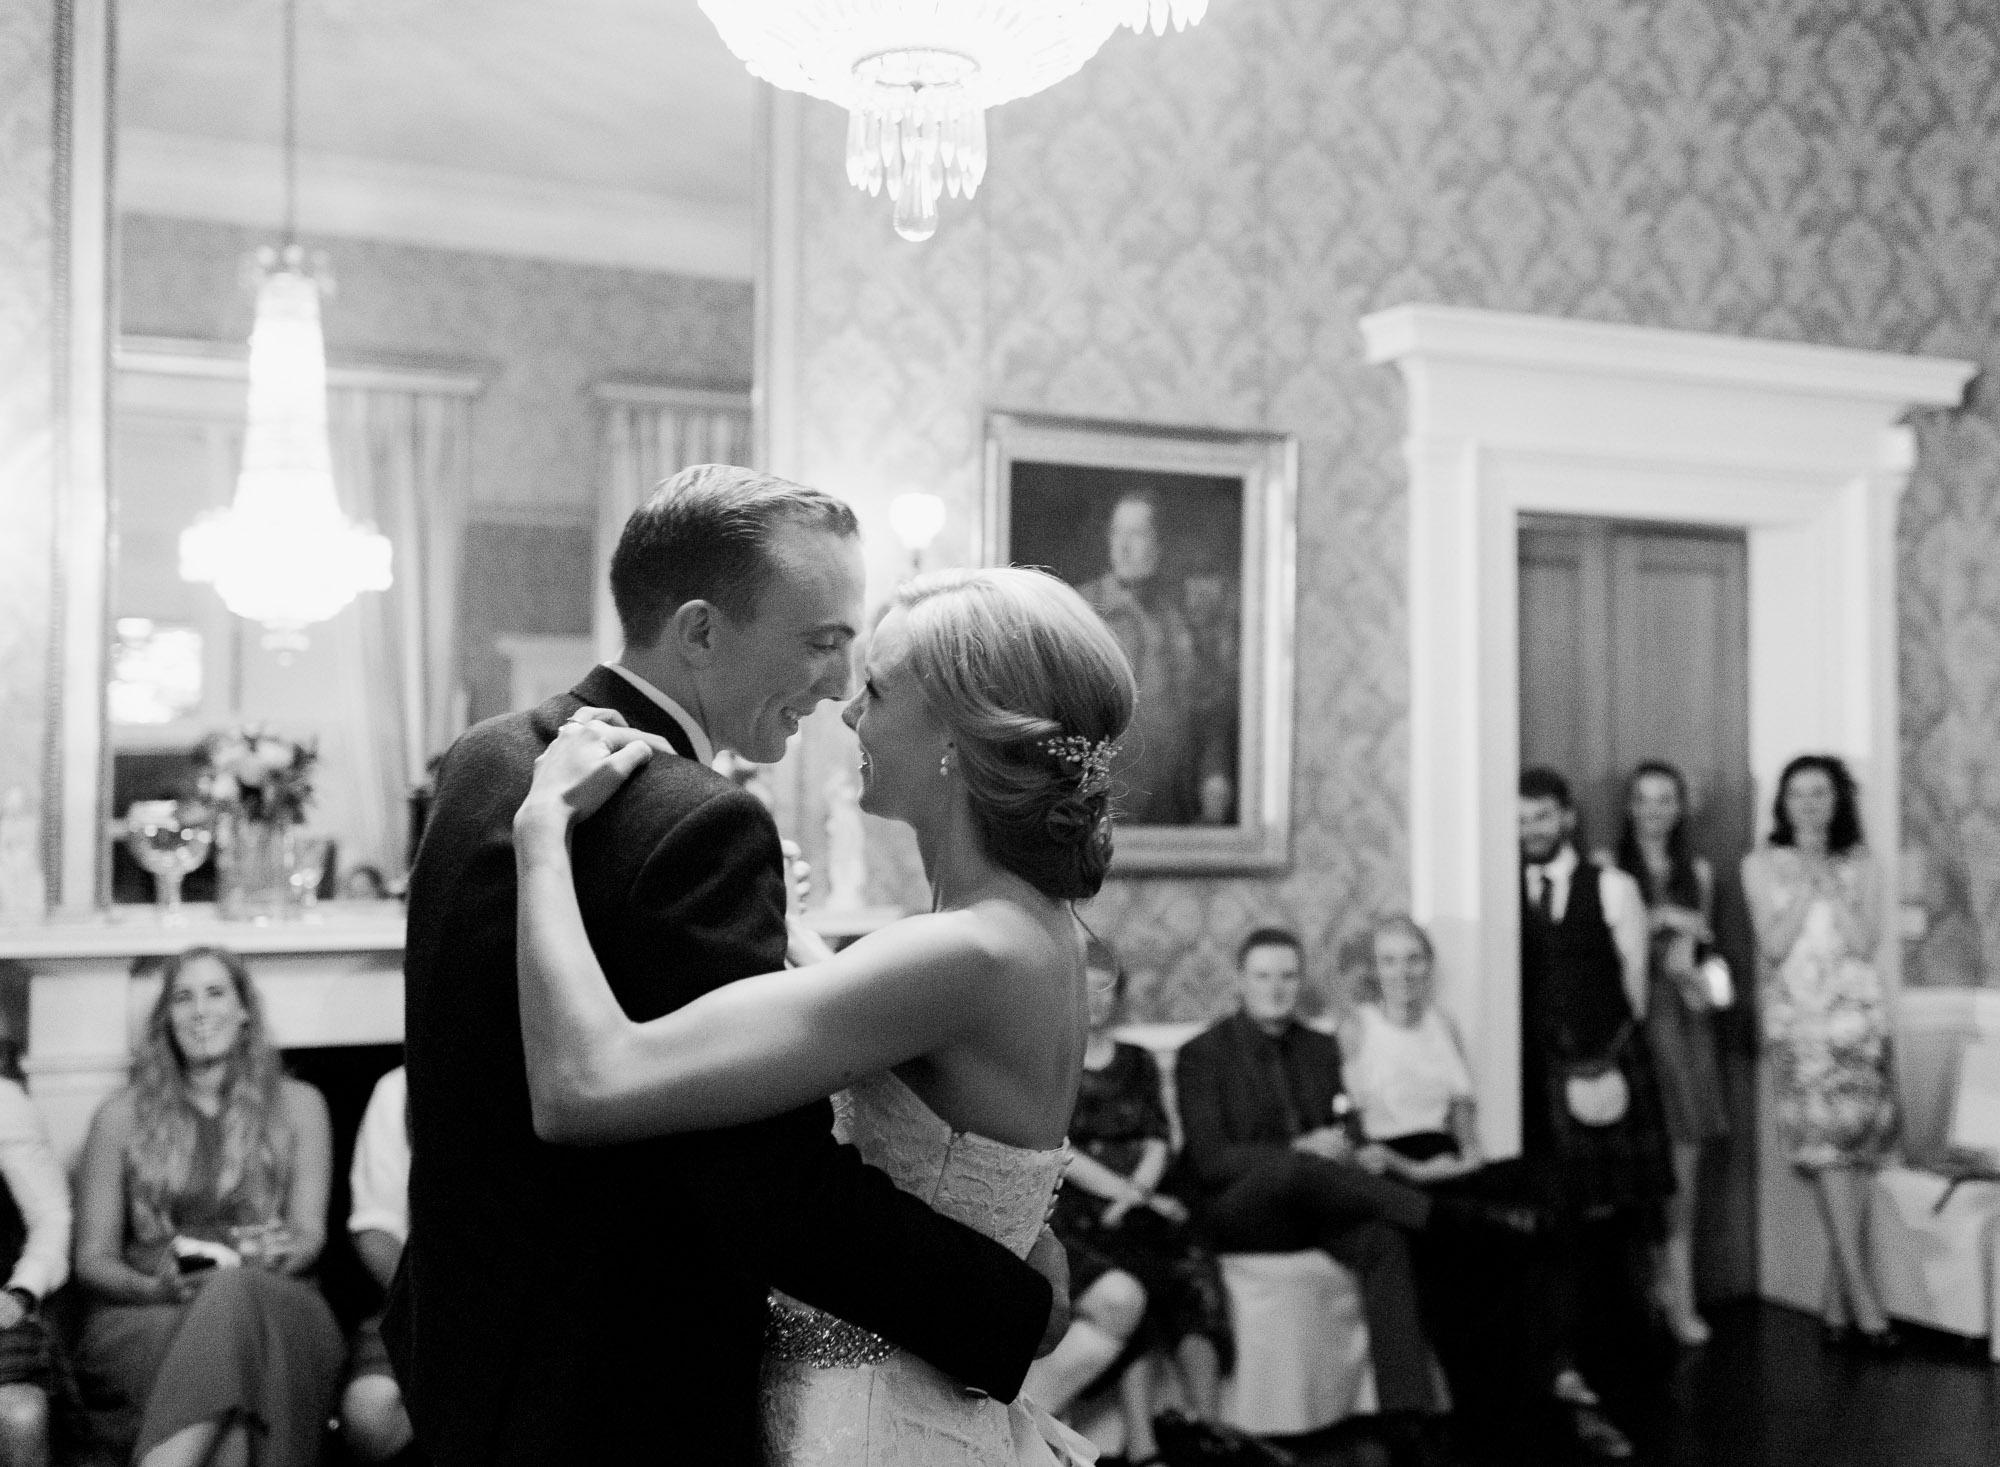 scottish_wedding_blairquhan_castle-104.jpg